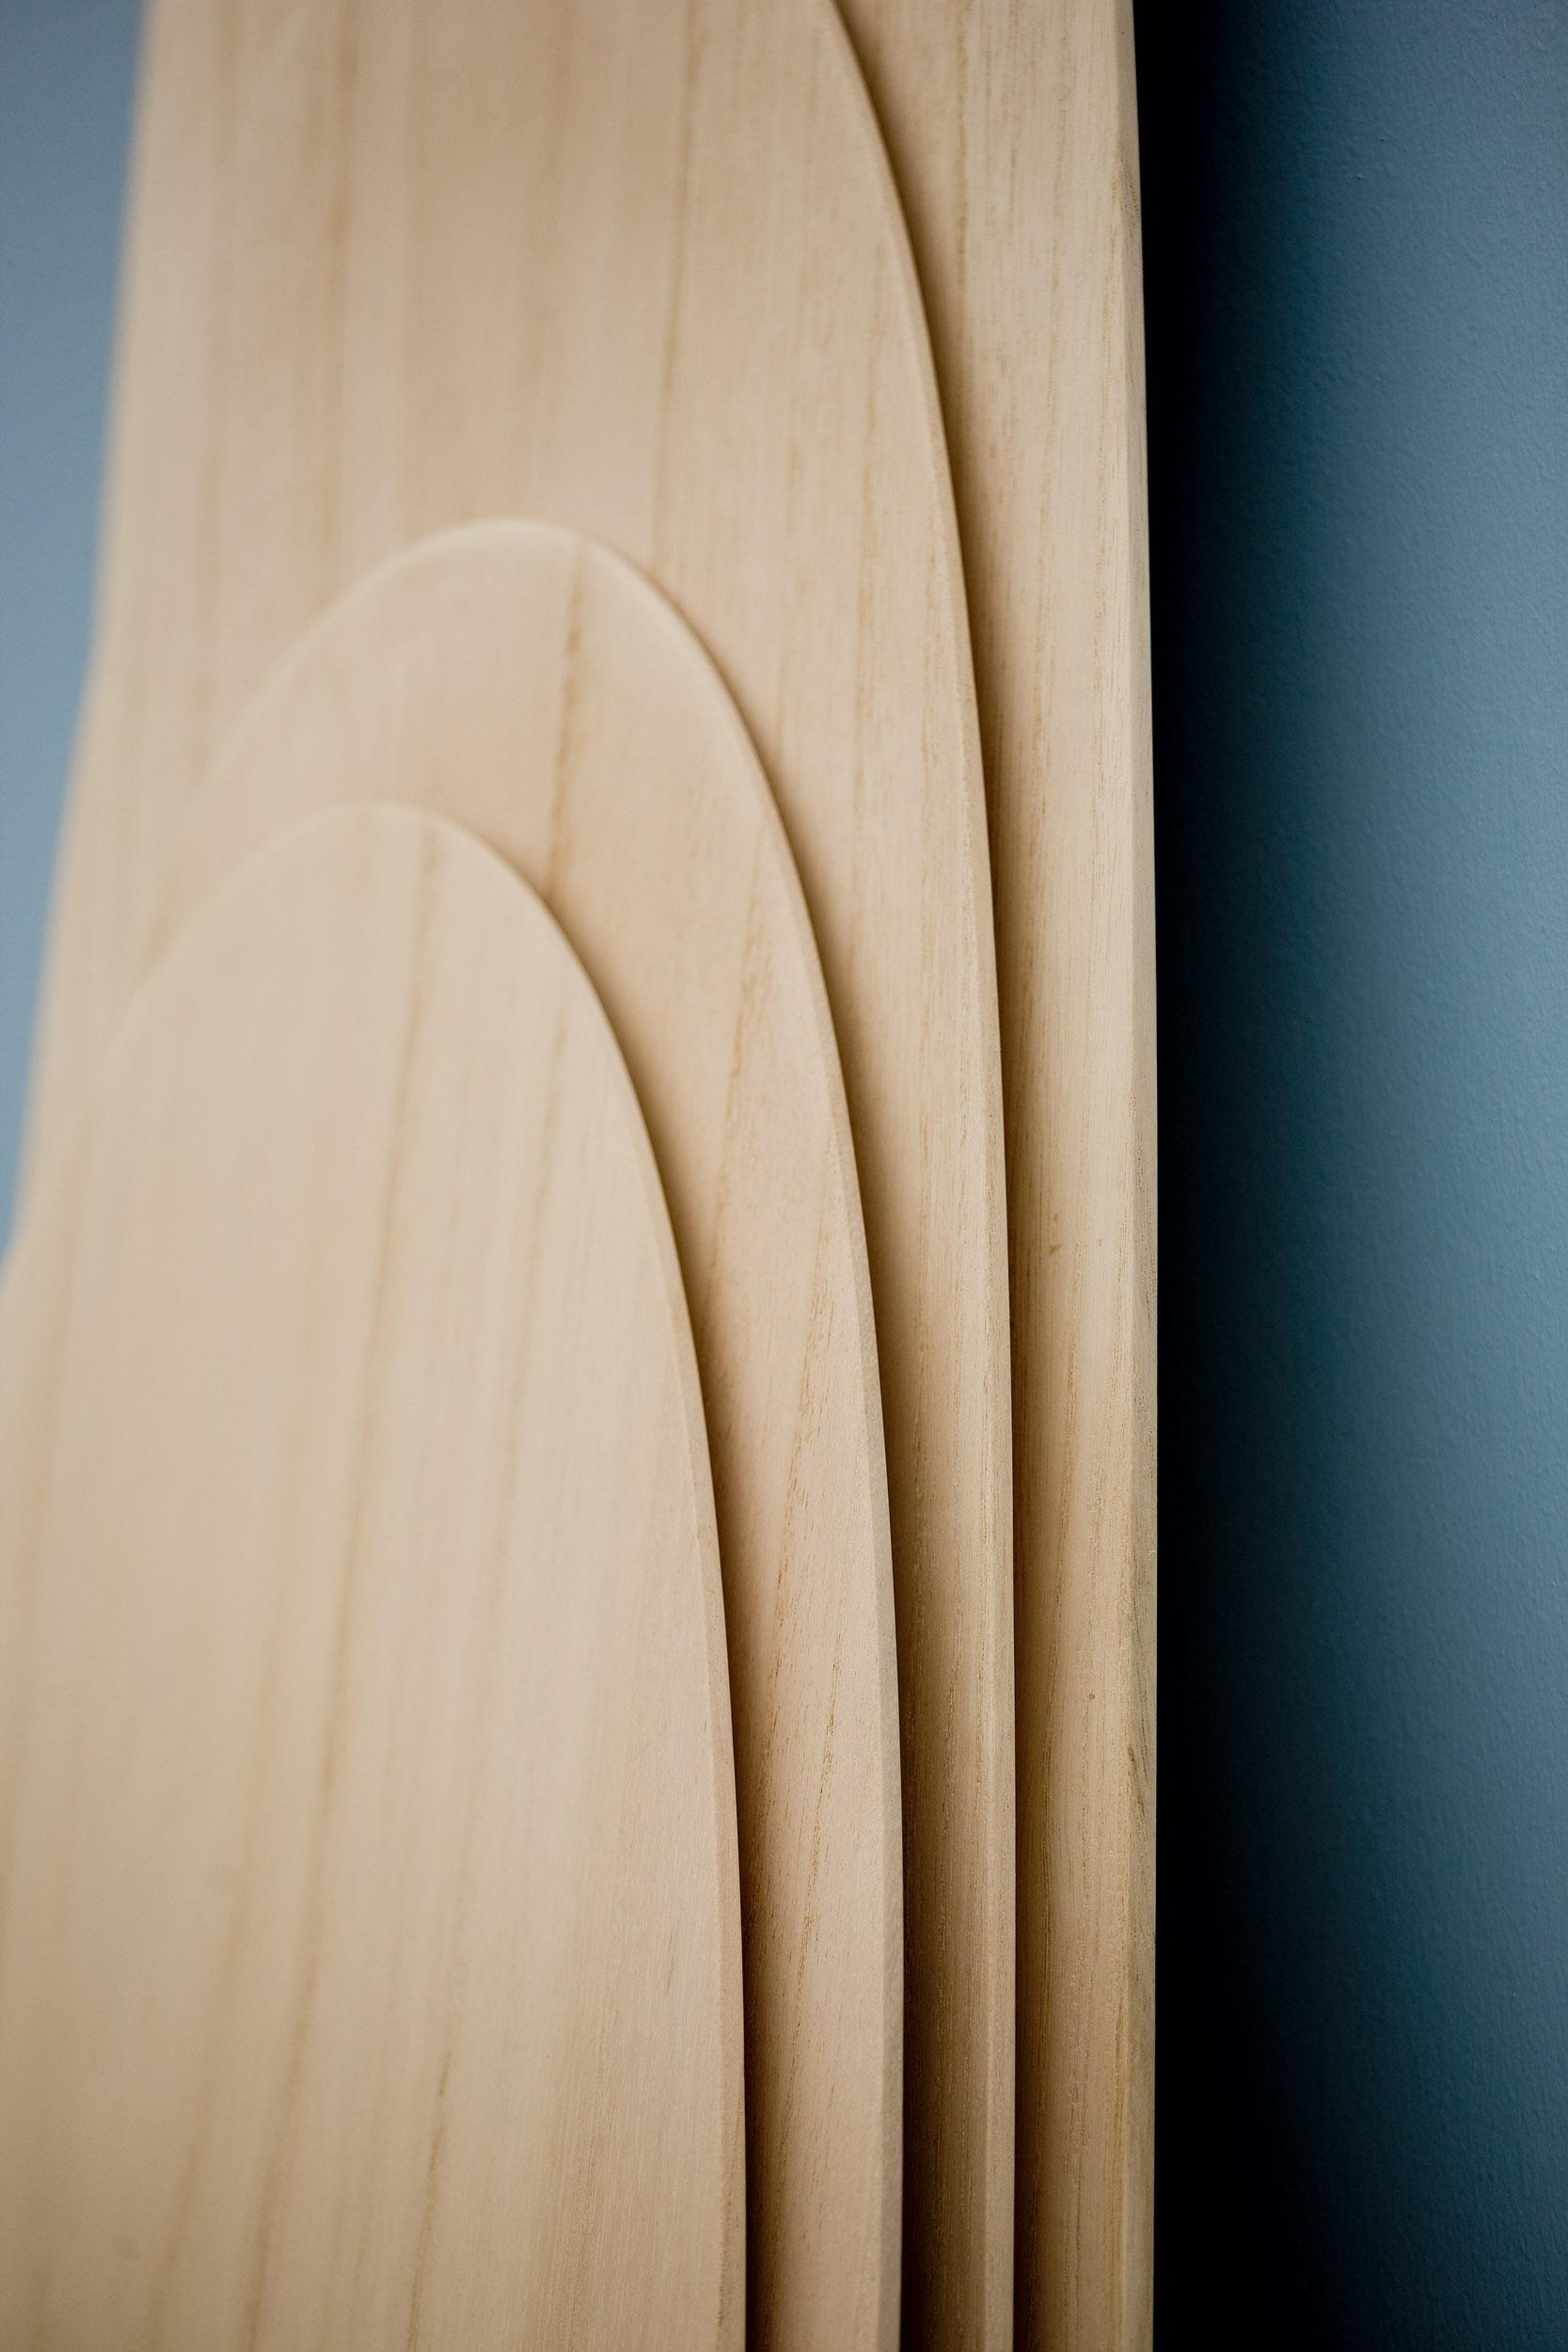 timber-surfboards.jpg